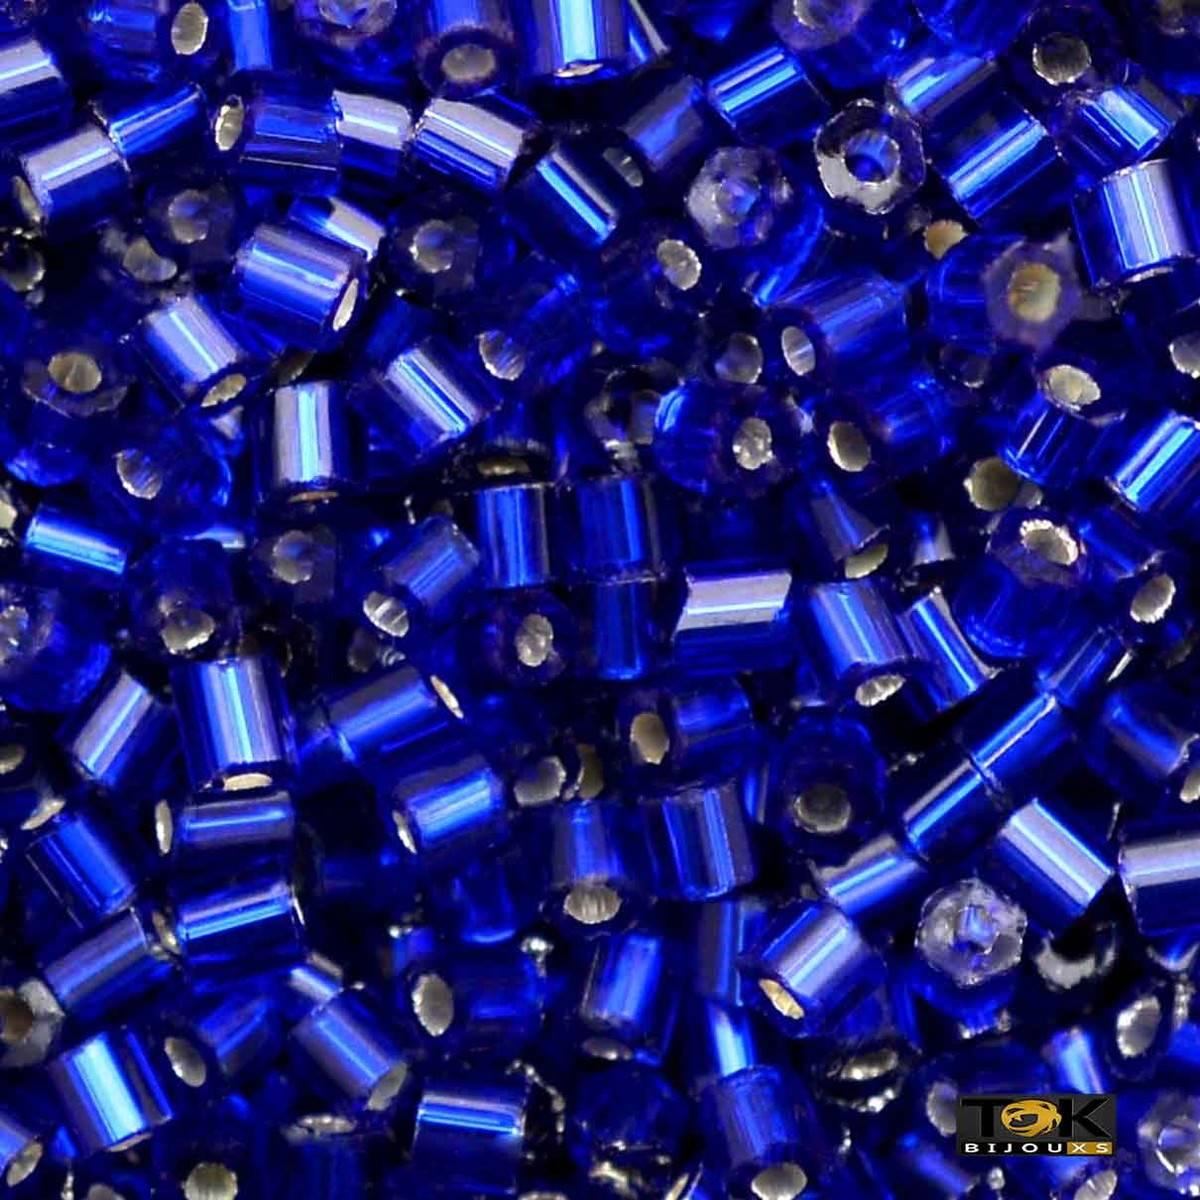 Vidrilho Jablonex Azul Royal Escuro Transp Ref.37100 25g